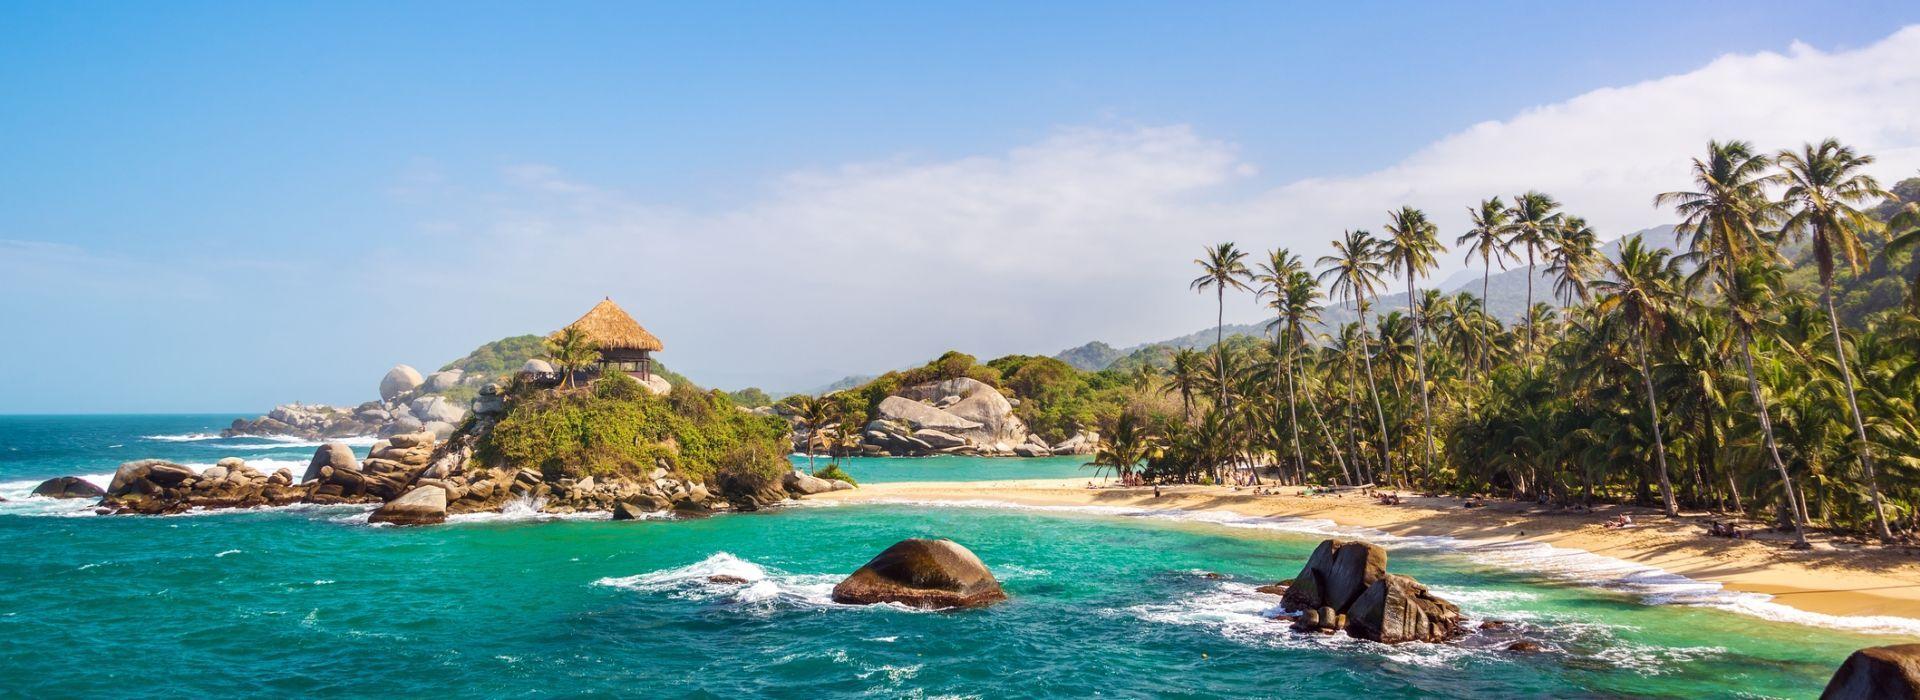 Rosario and San Bernardo Islands Tours